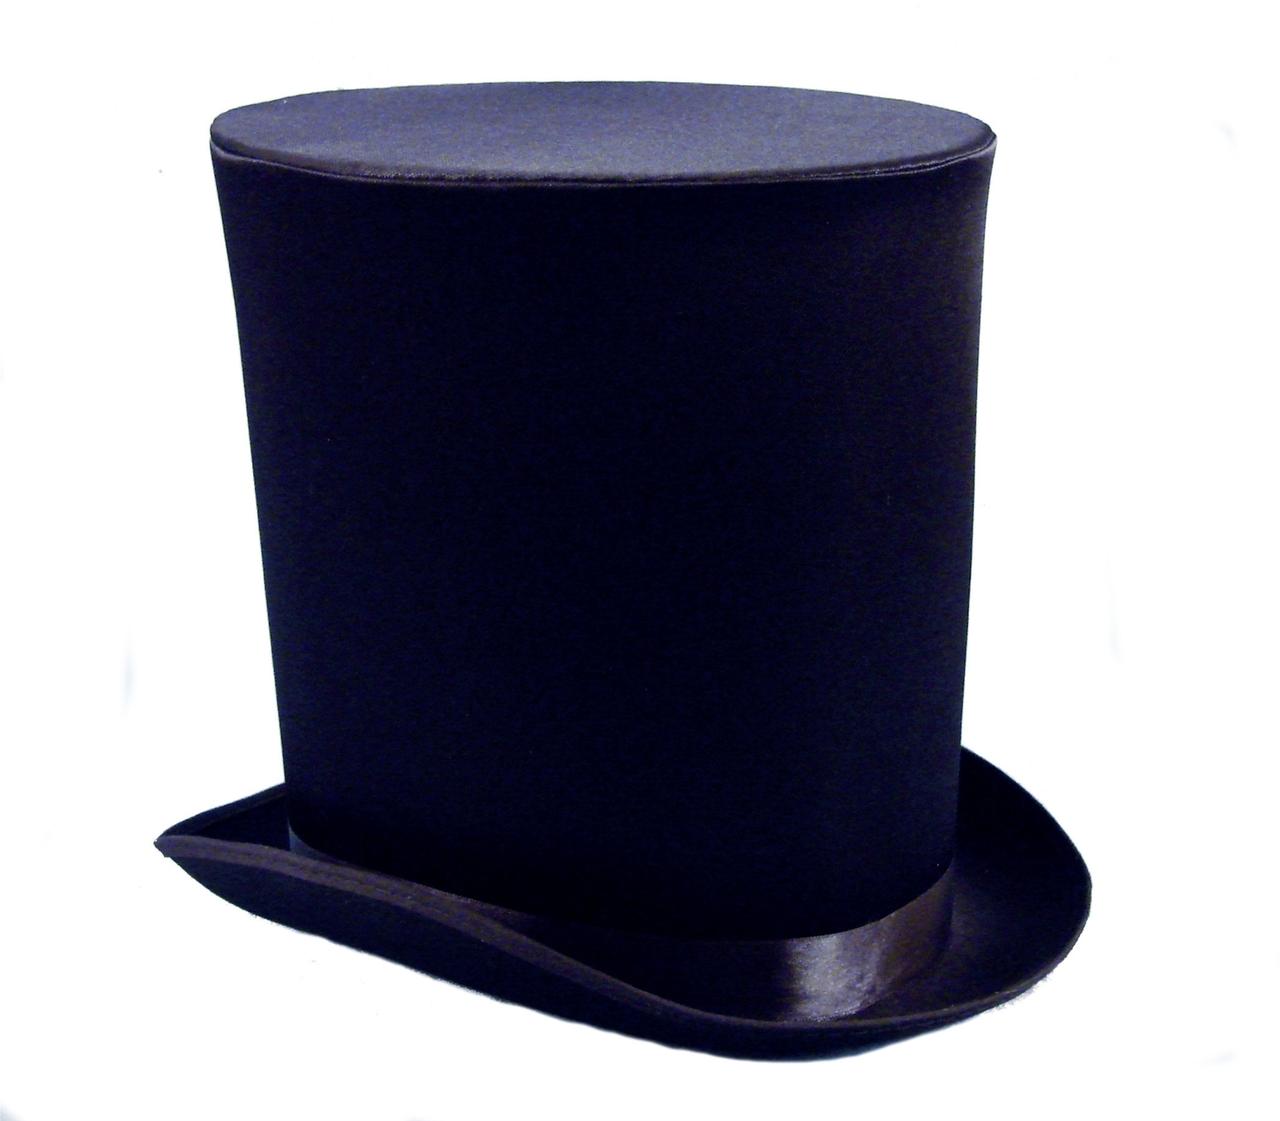 e1b6badf4fa Victorian Coachman Hat - The Costume Shoppe